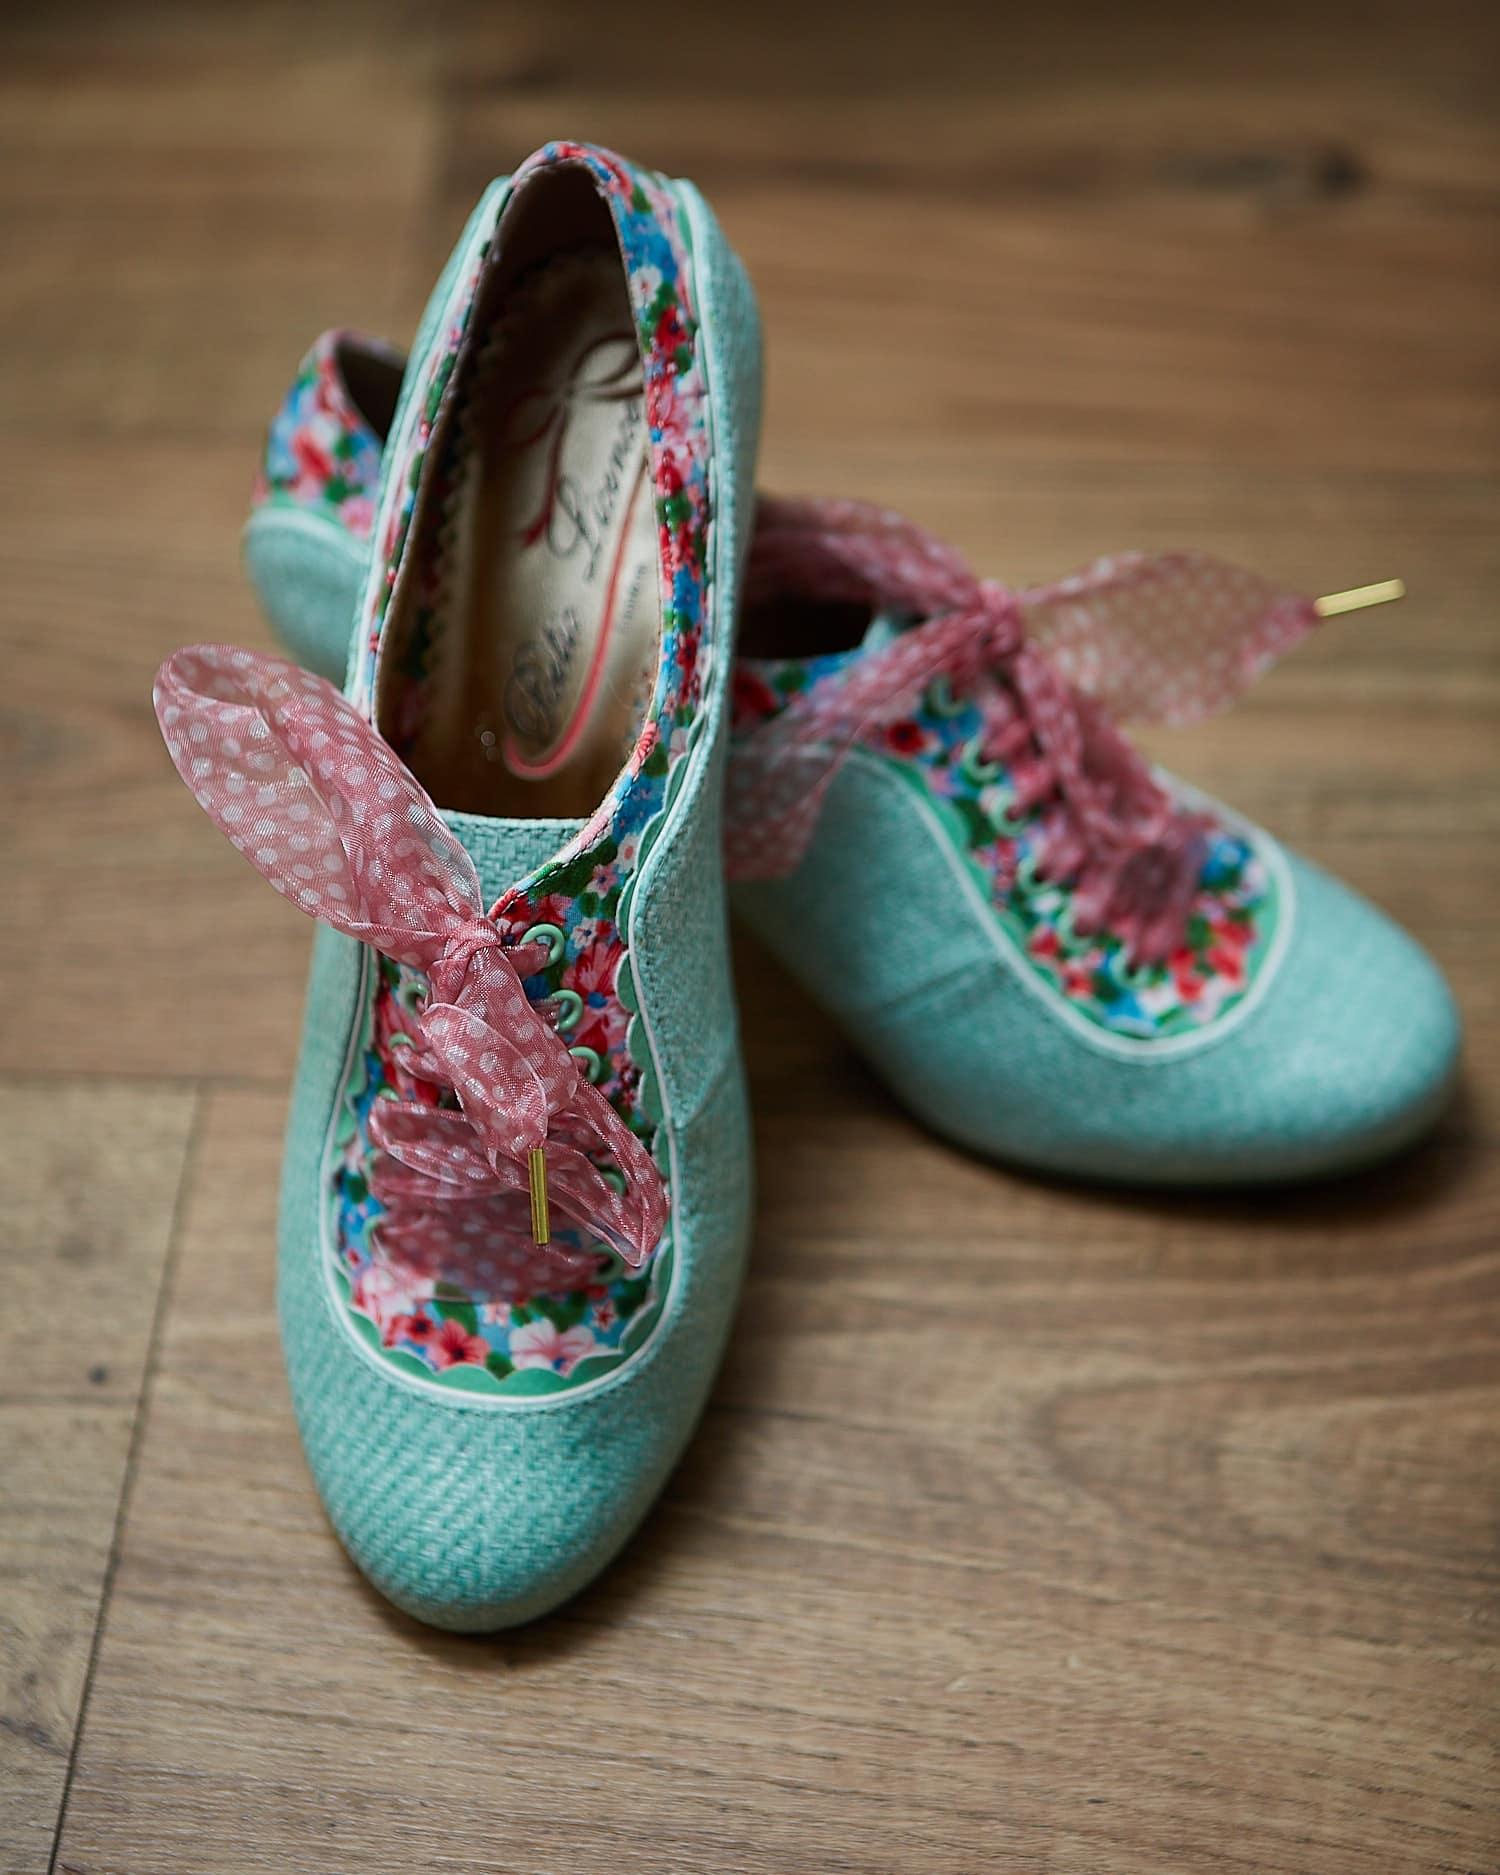 Irregular Choice wedding shoes on a wooden floor